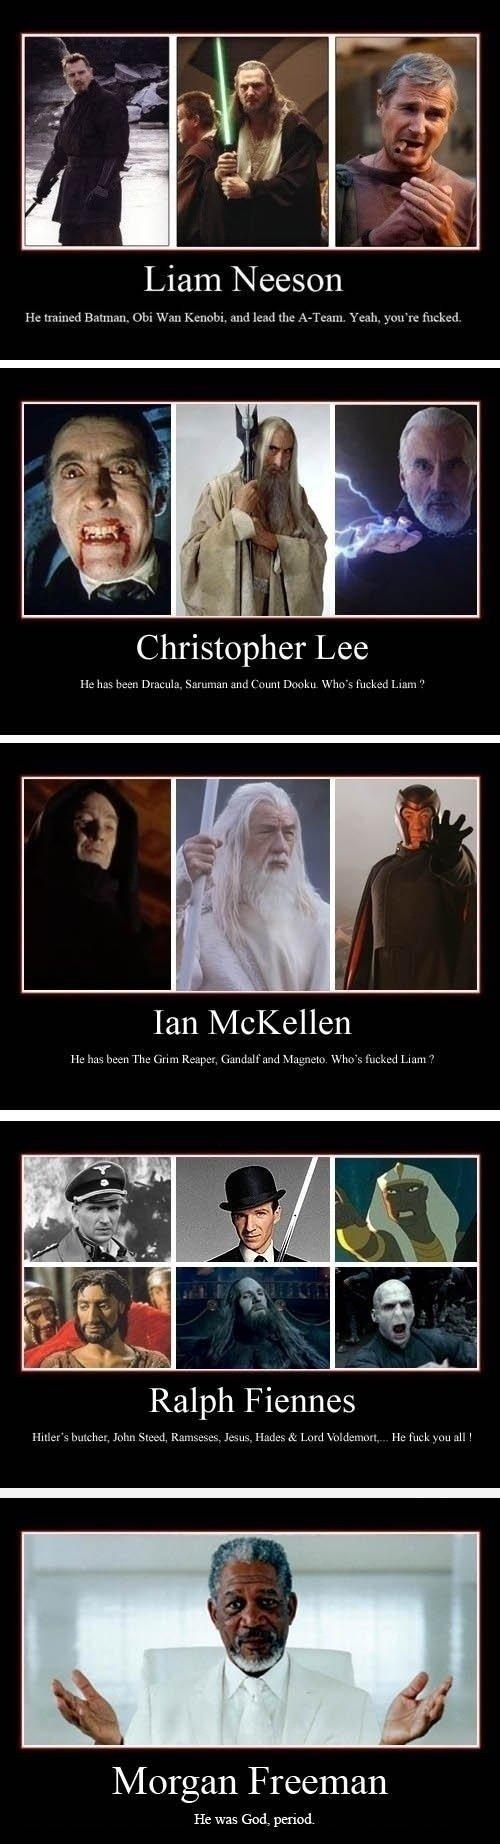 "So I hear Liam Neeson is a badass. mehh... Liam has had way more badass roles Taken? The Grey?. Liam Neeson Hr: tr, emerl Dnim, m, this Wan , nnd [ Luish. you'"""